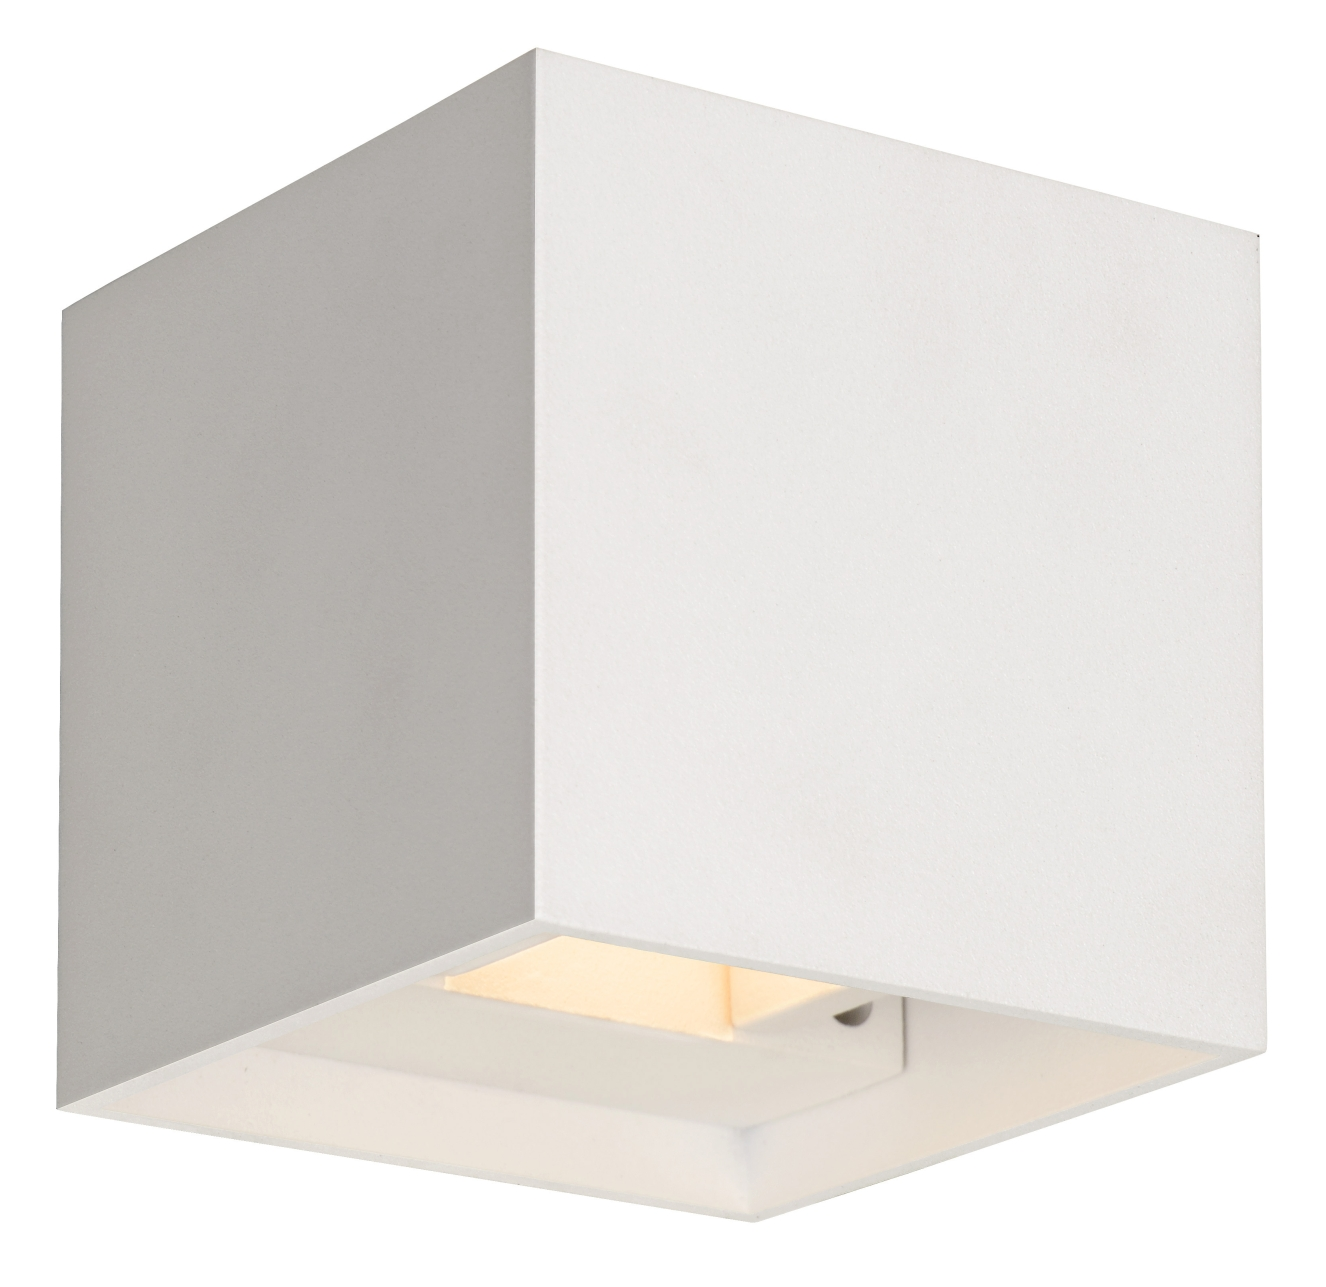 Lucide Wandlamp Xia - LED - Wit